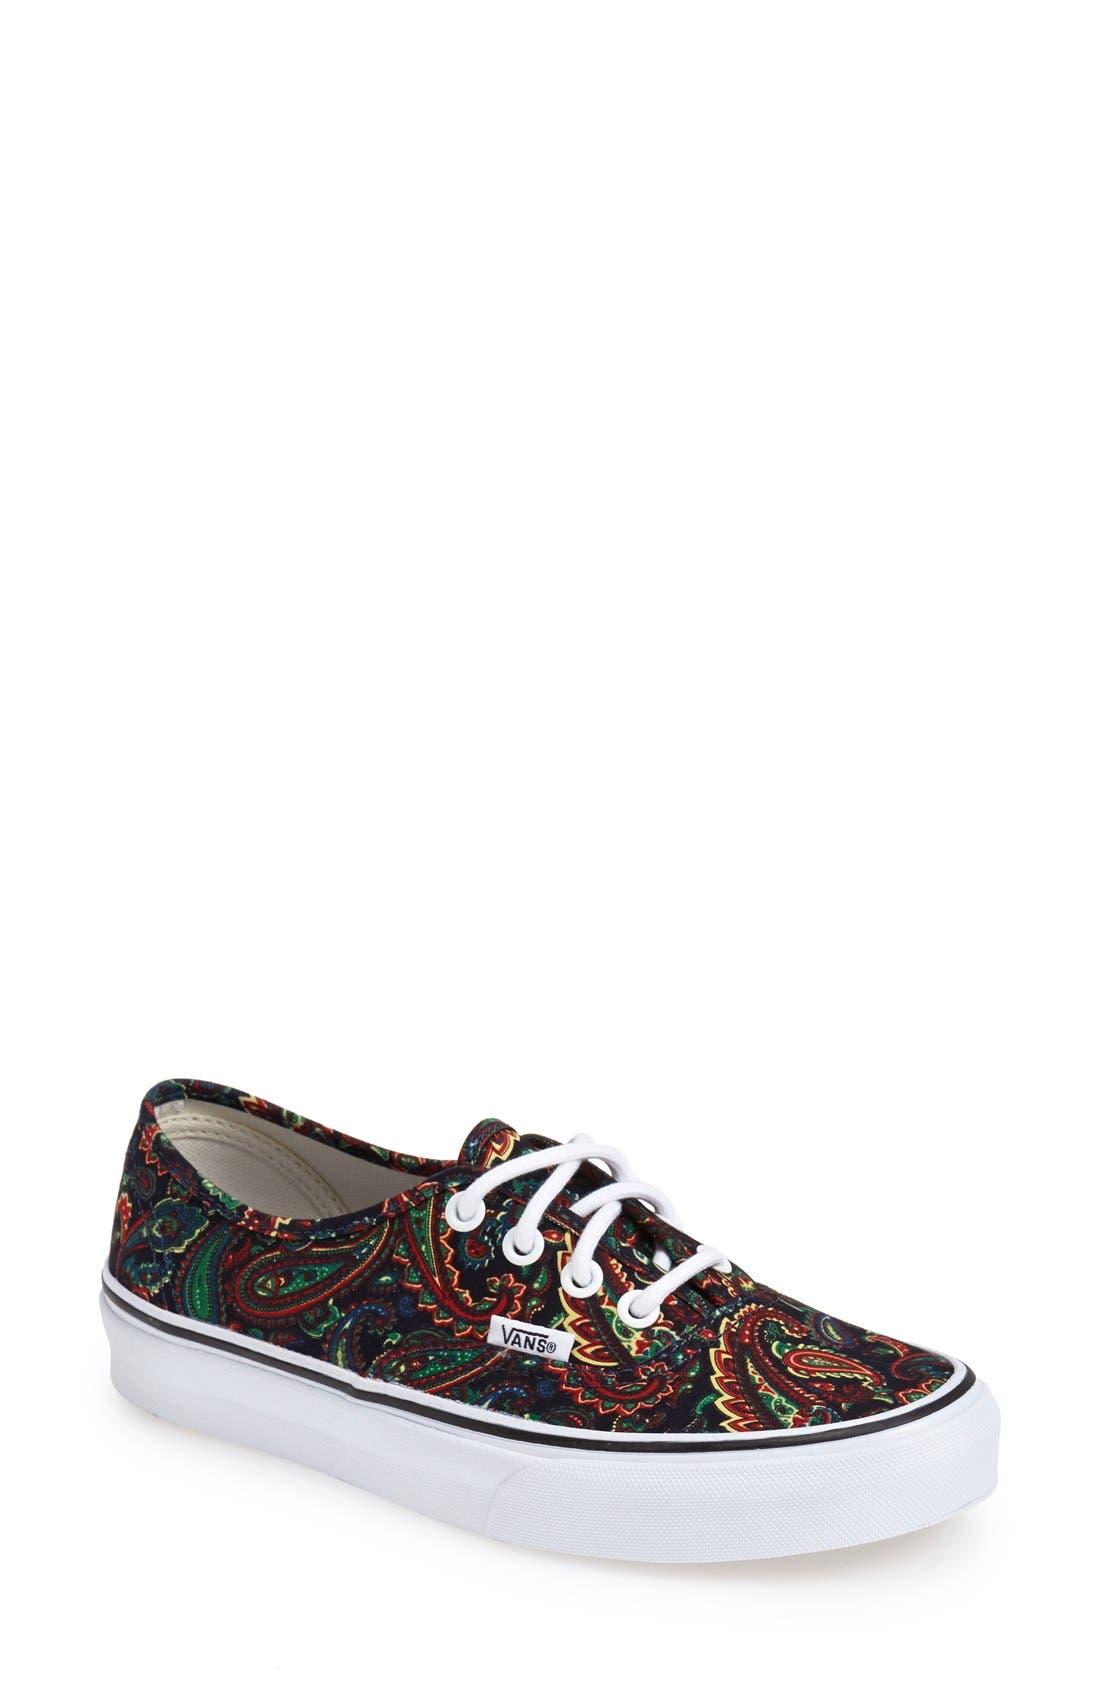 Alternate Image 1 Selected - Vans Authentic Paisley Print Sneaker (Women)